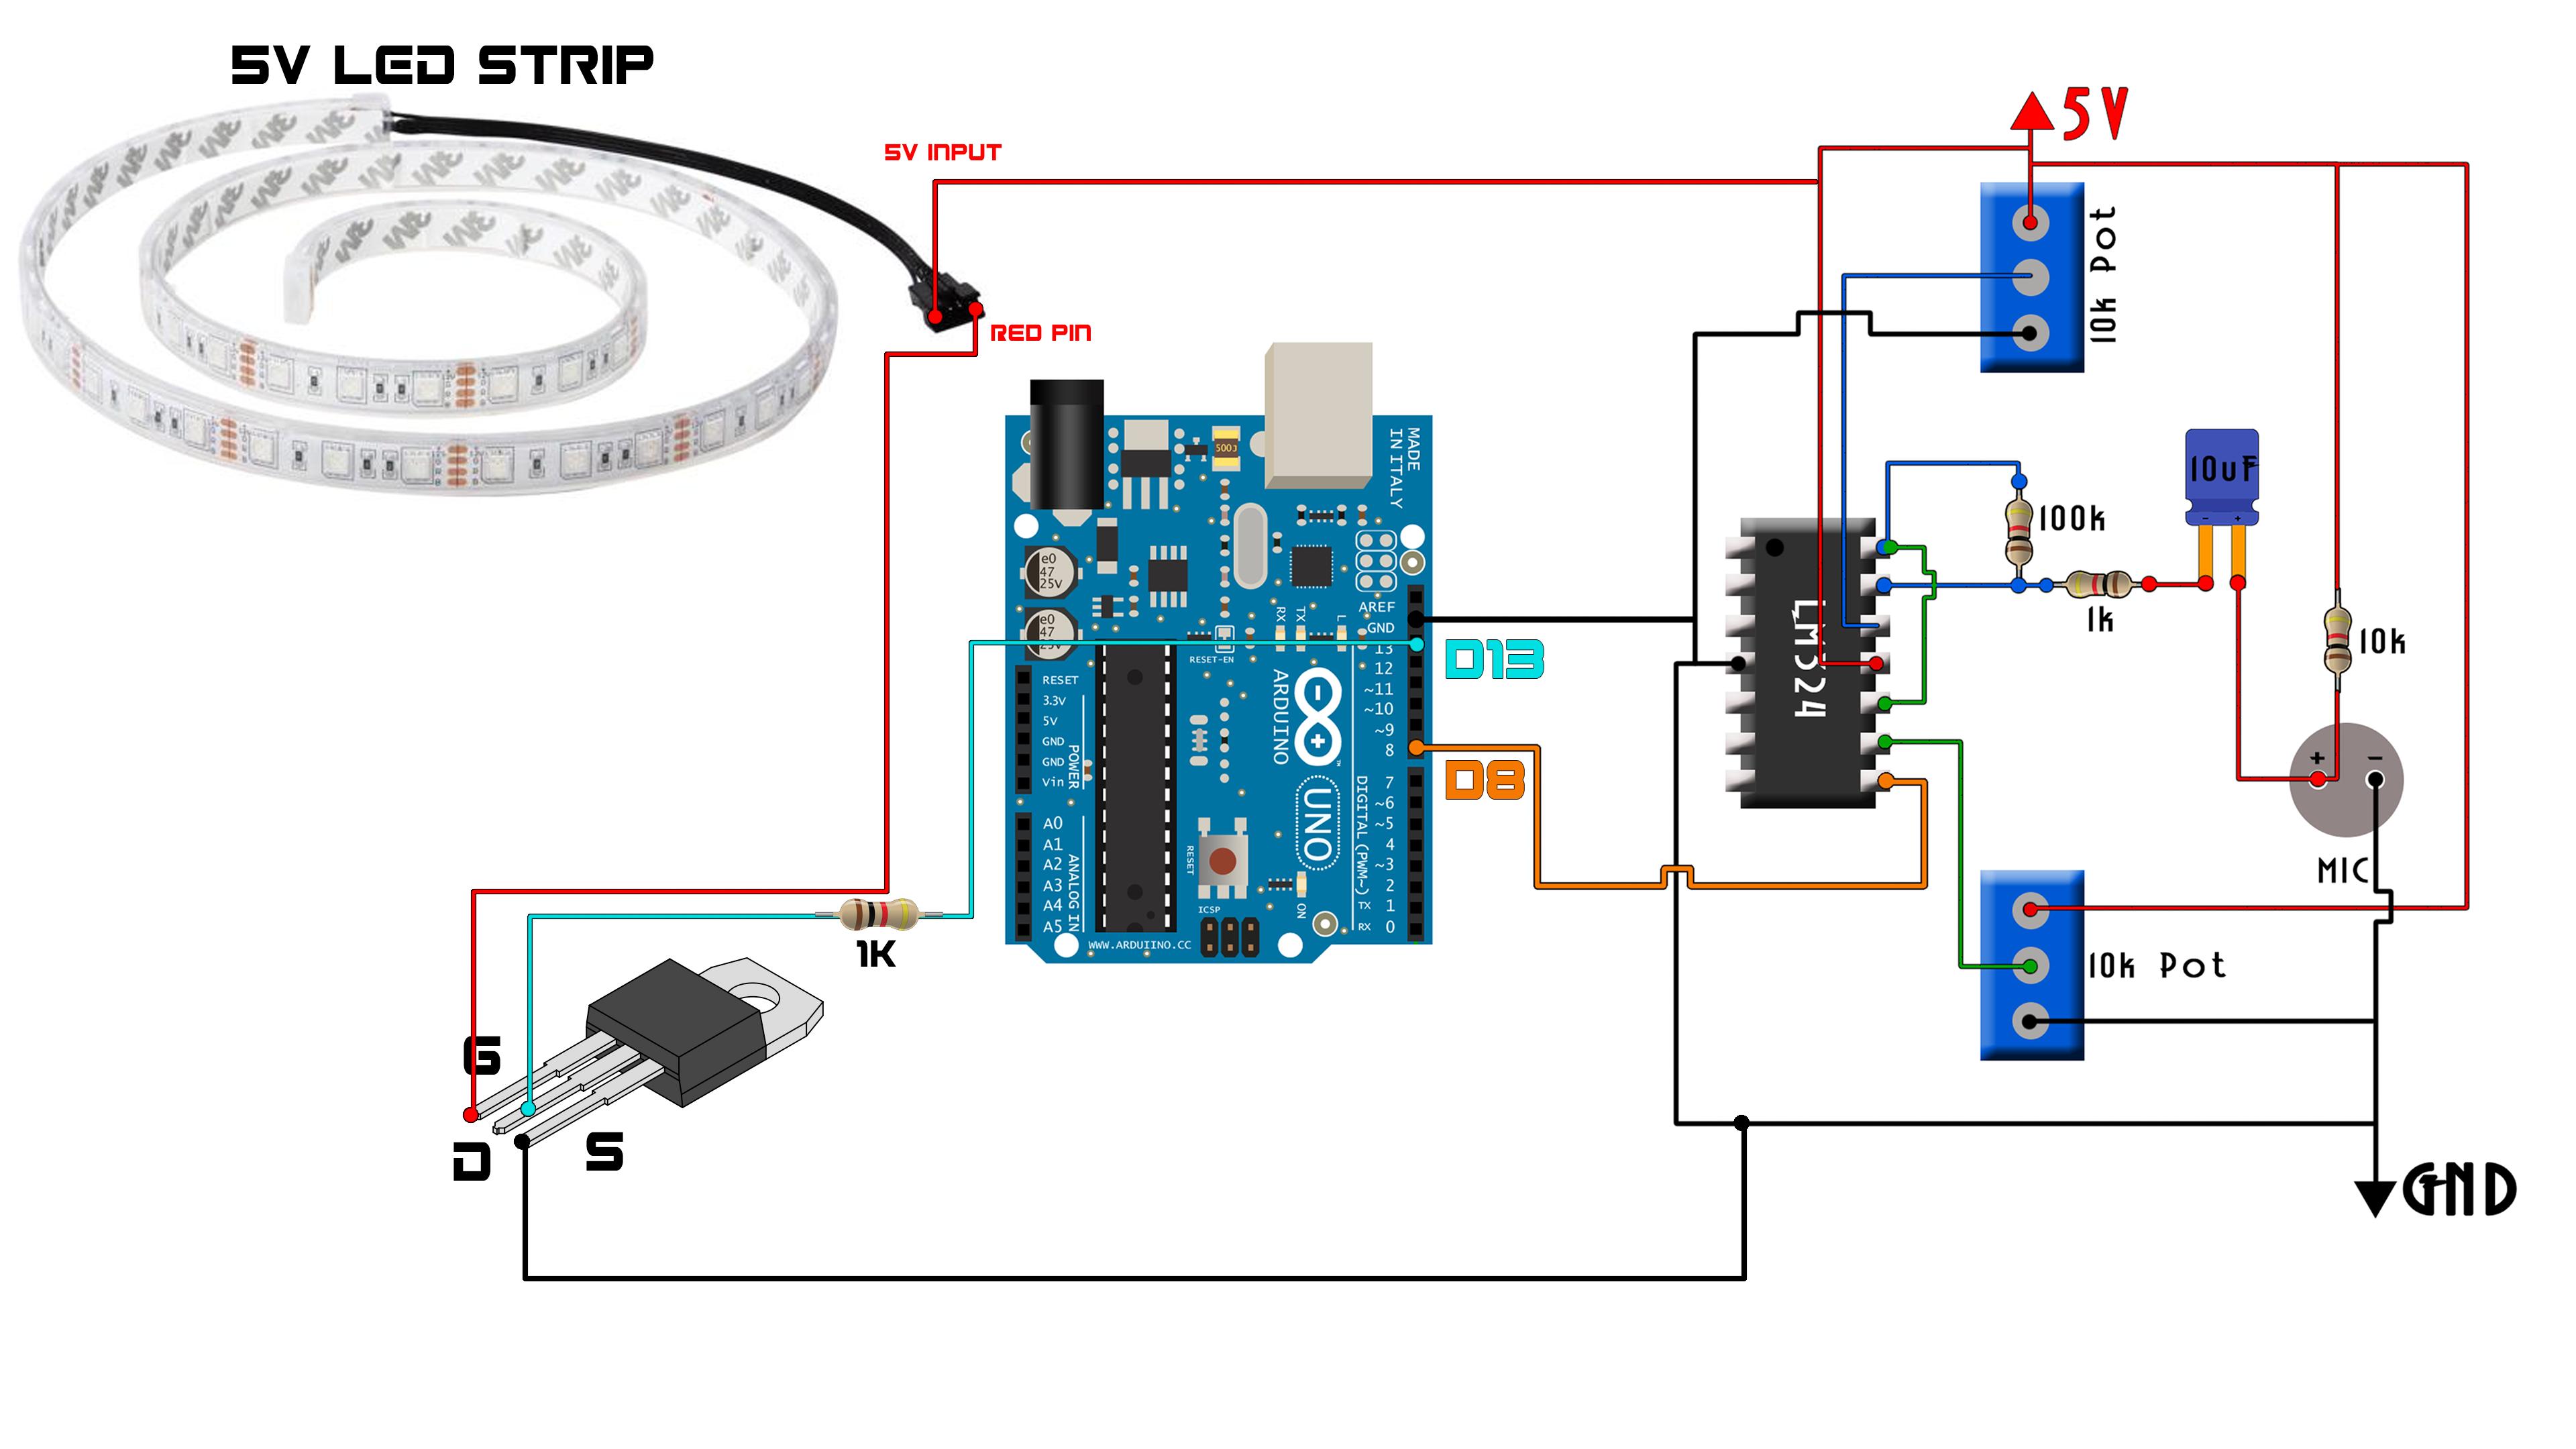 Code whistle LED strip siwtch arduino